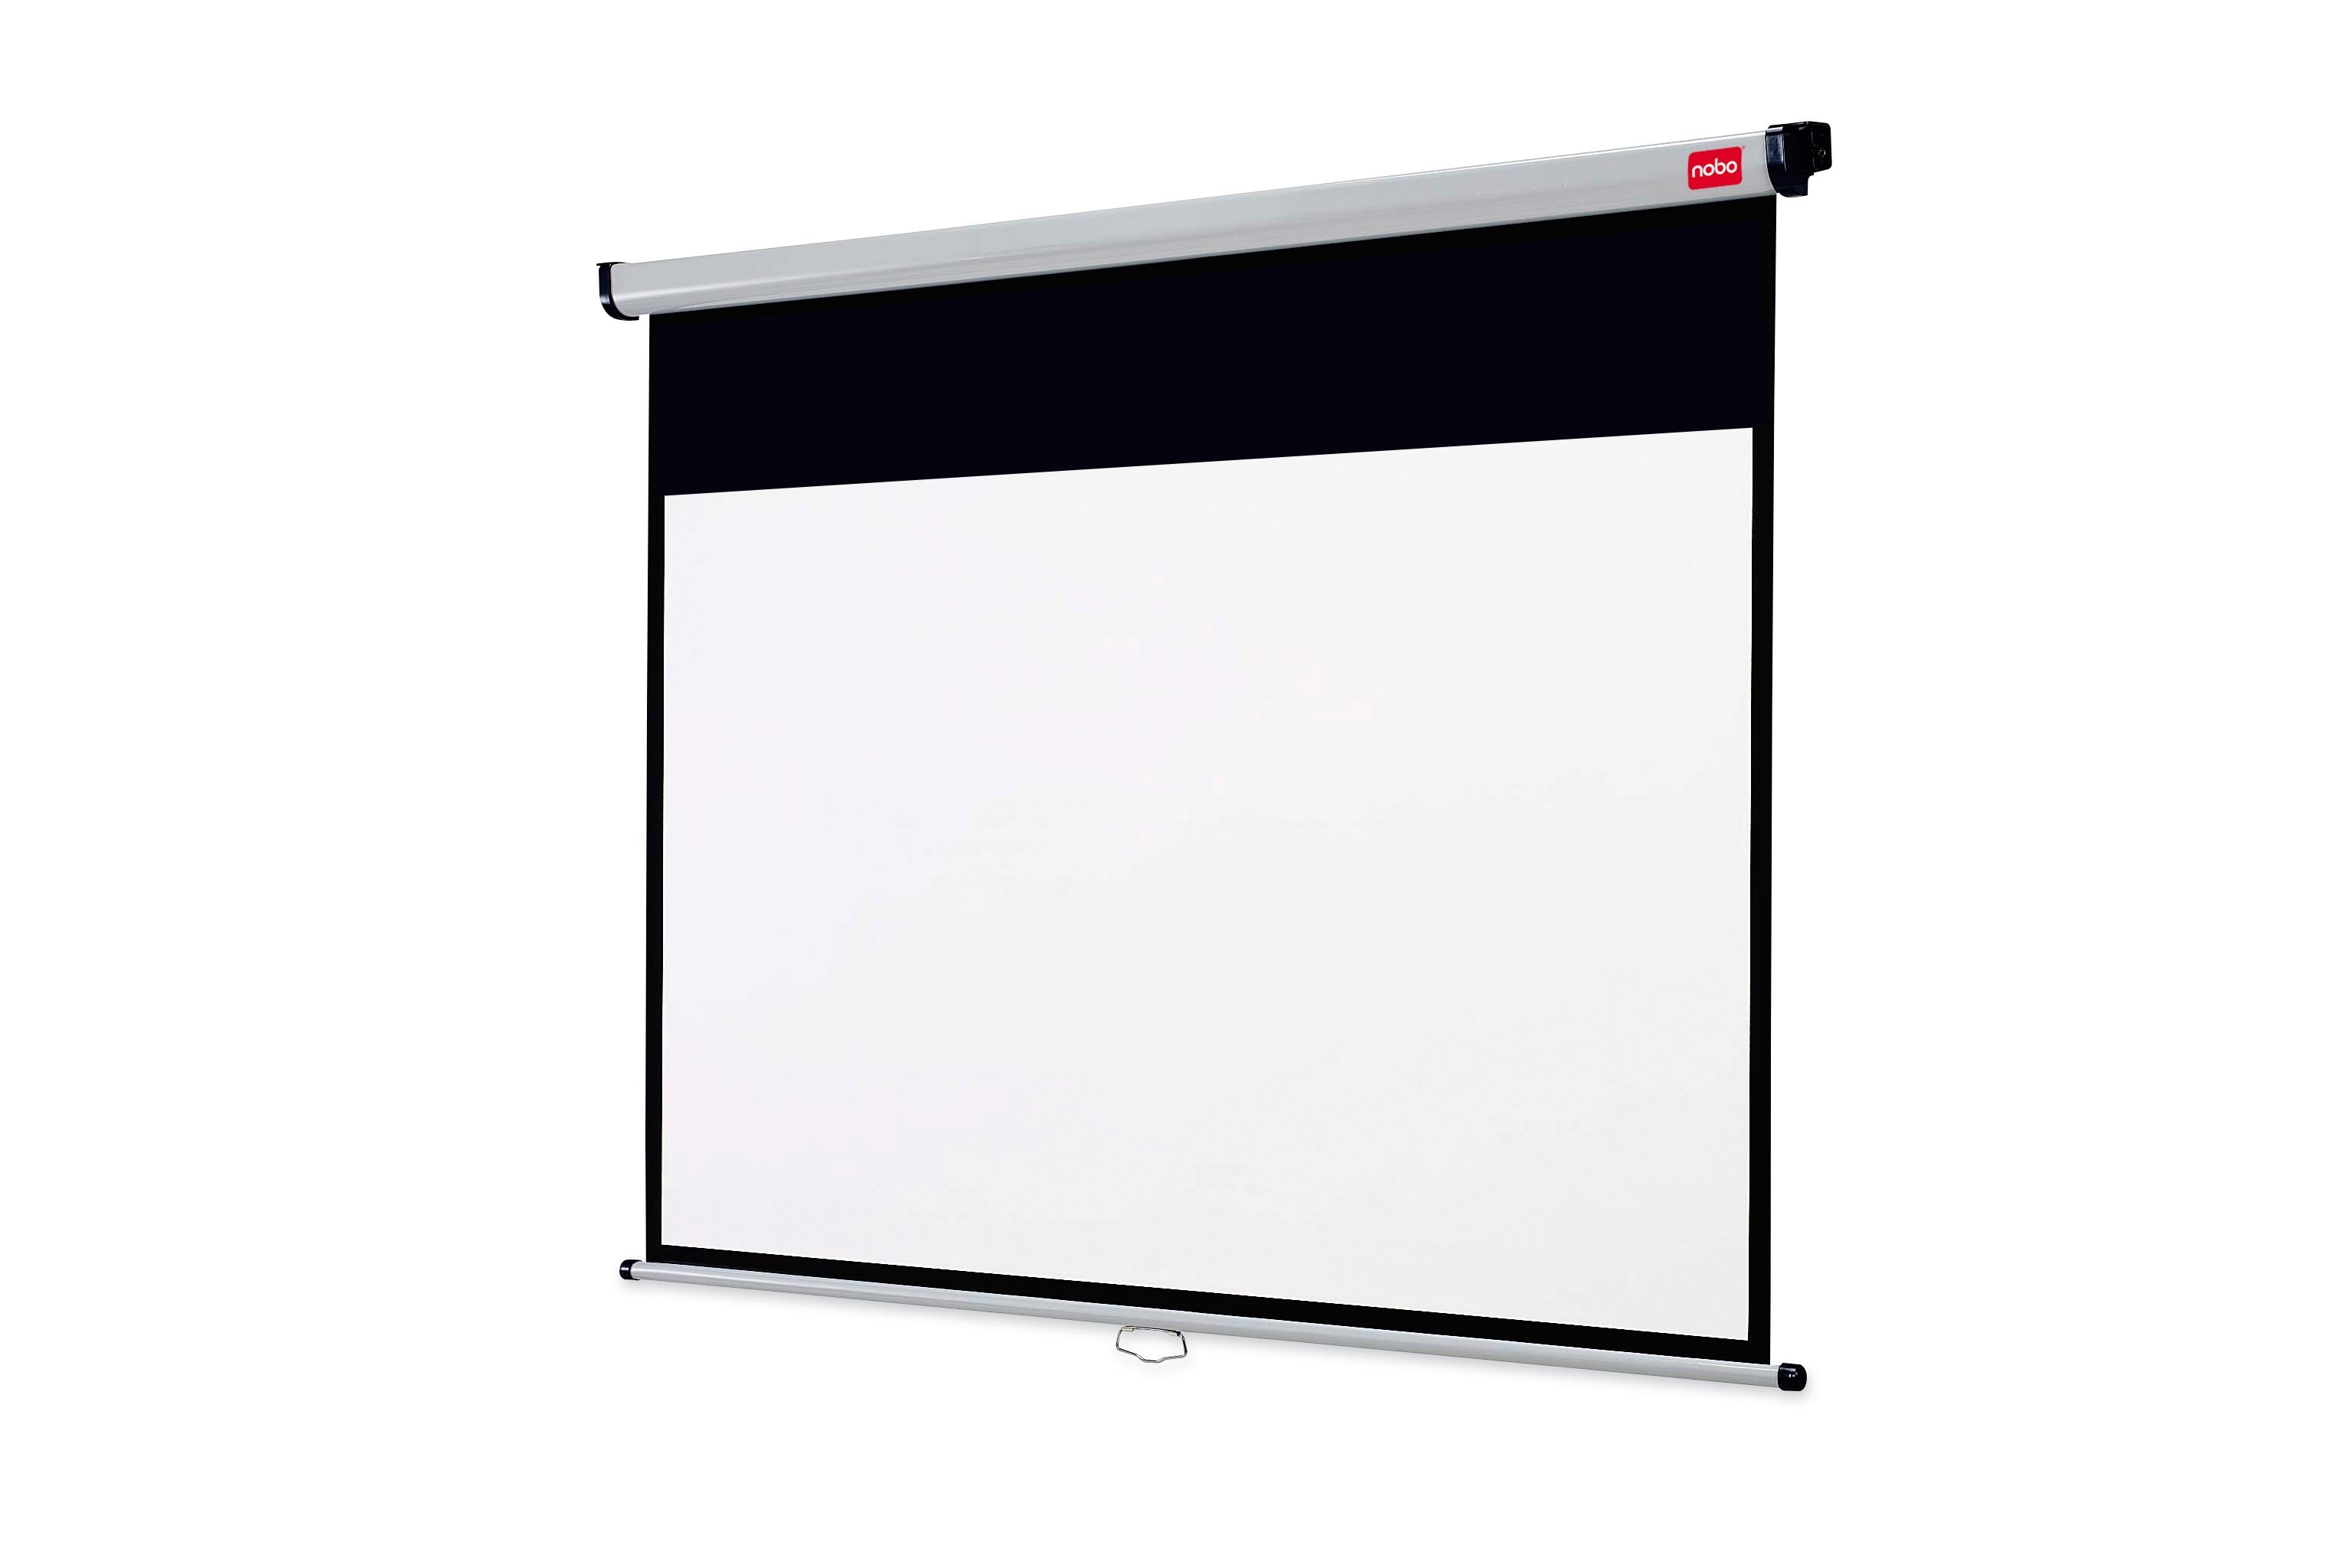 nobo ecran de projection lectrique plugn play 2450 x 1850 mm. Black Bedroom Furniture Sets. Home Design Ideas